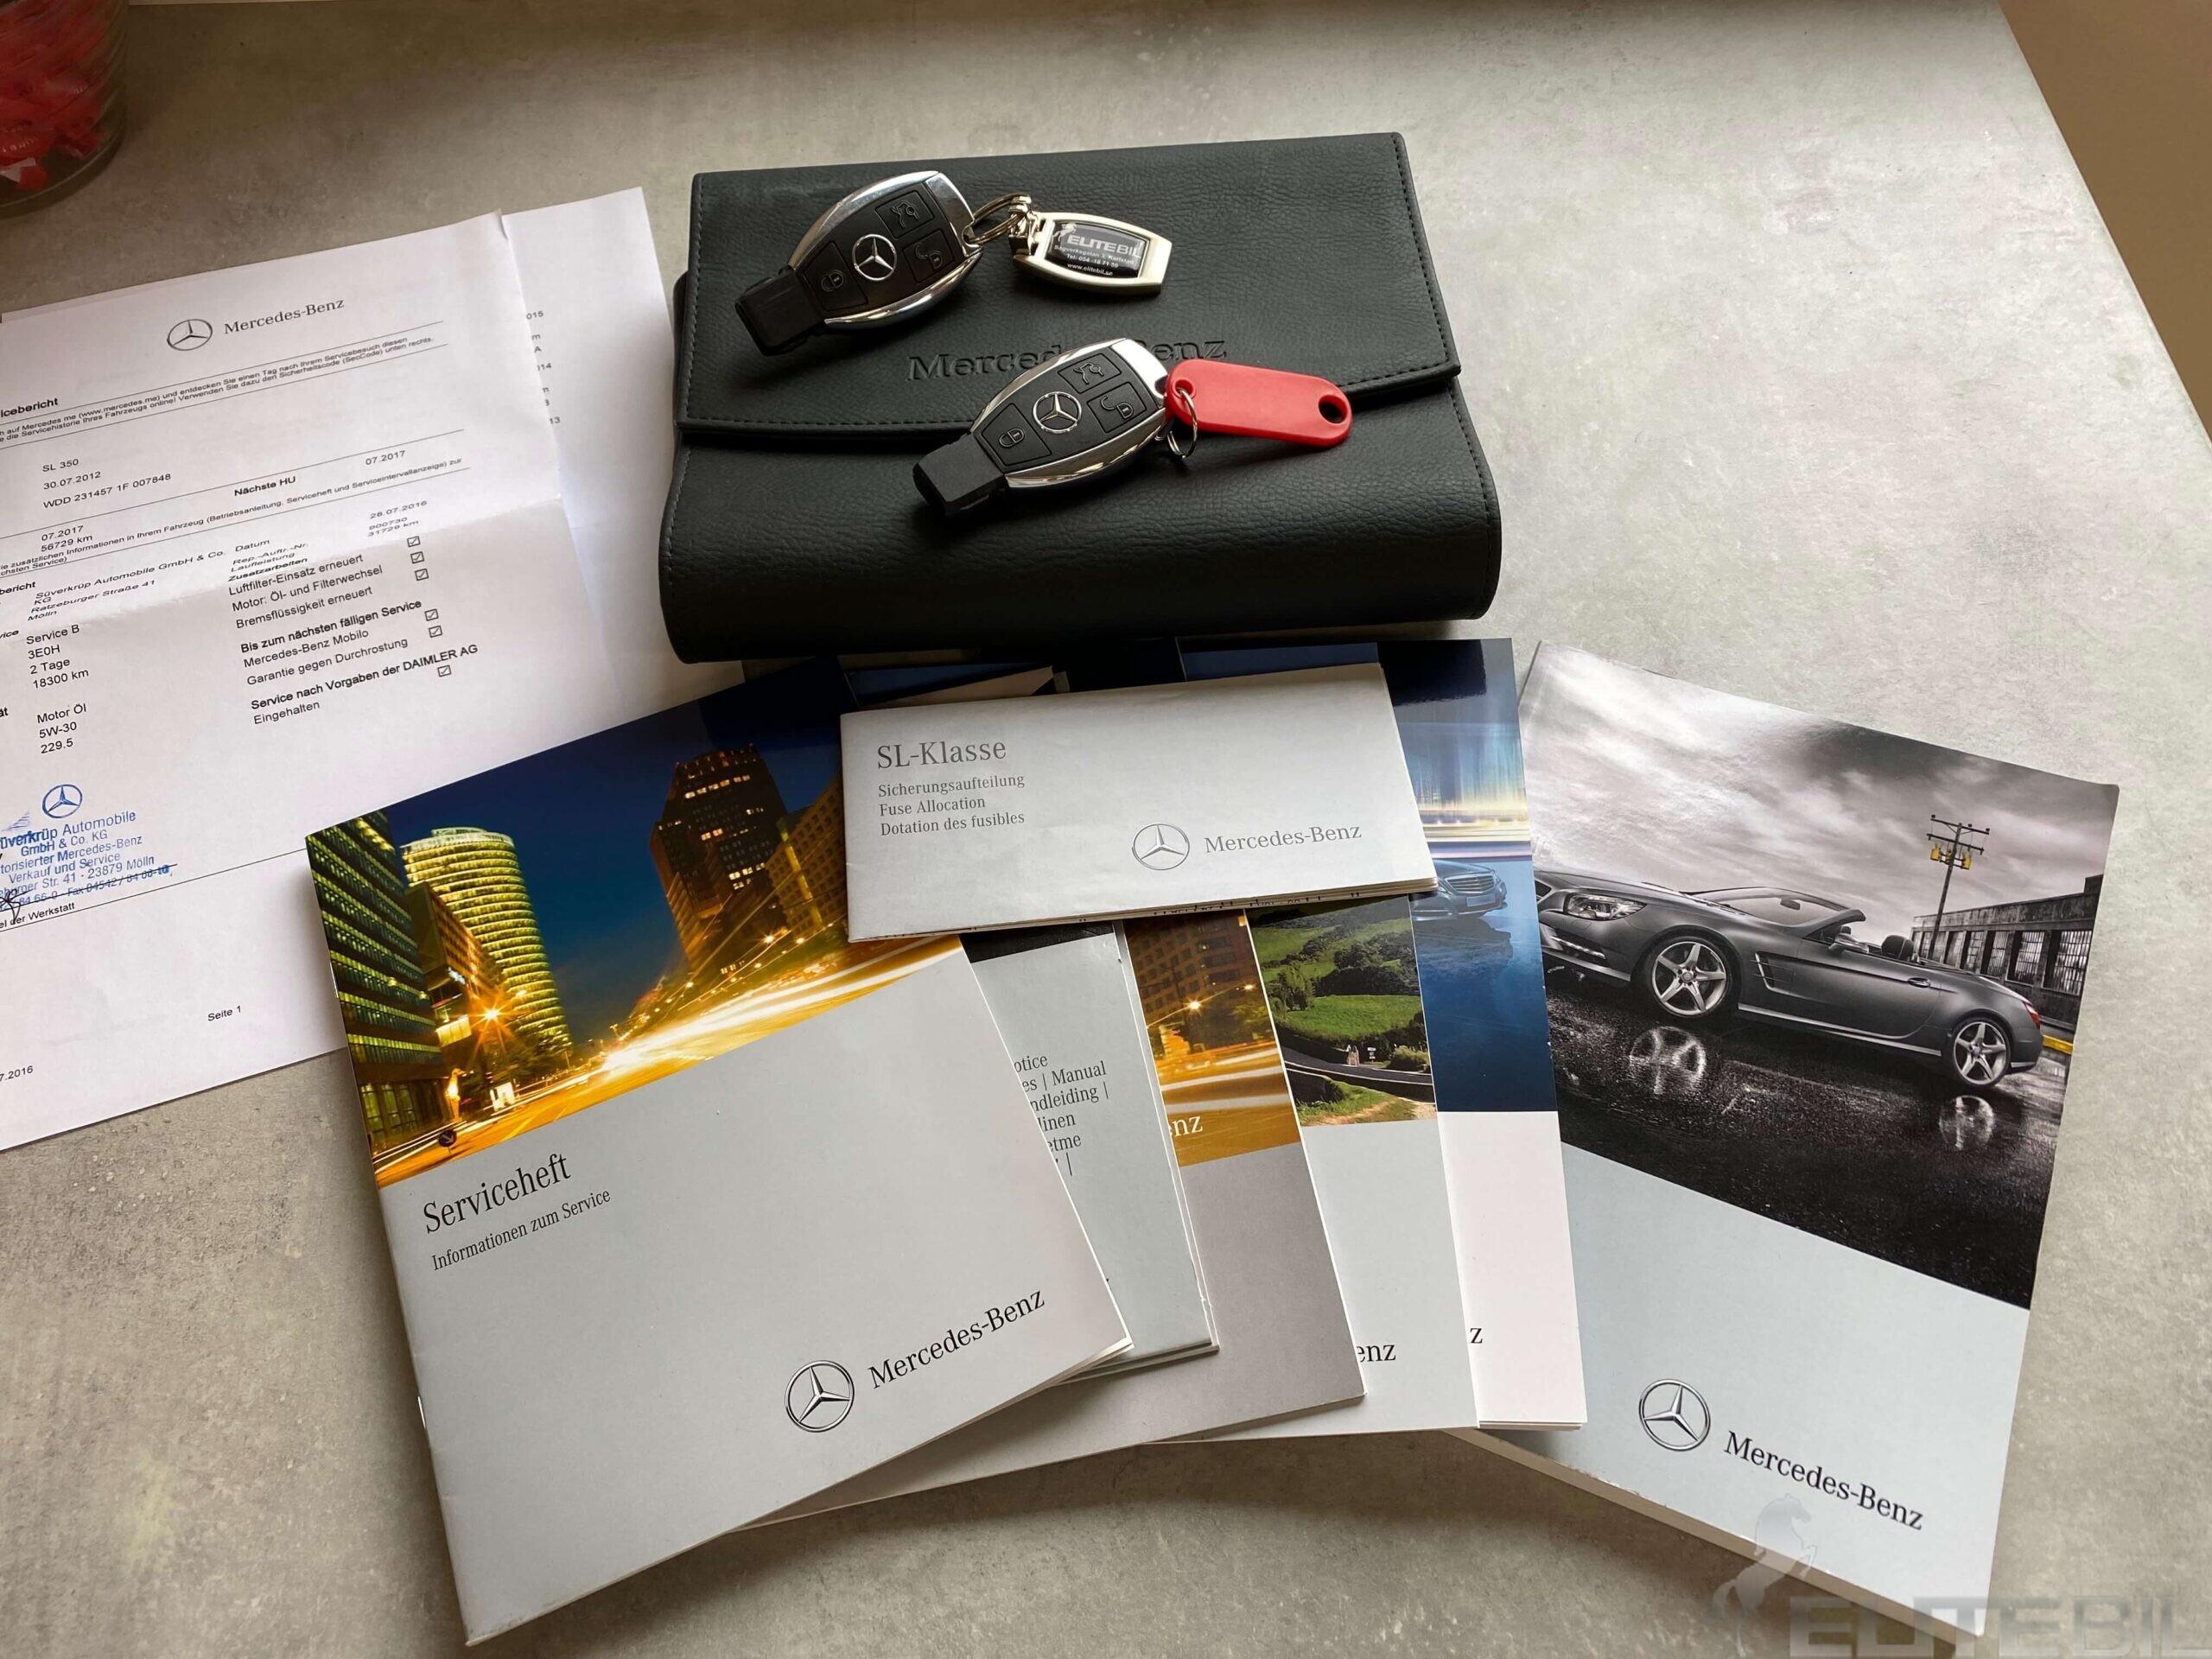 Mercedes-Benz SL 350 7G-Tronic 306hk Bör Ses (19)